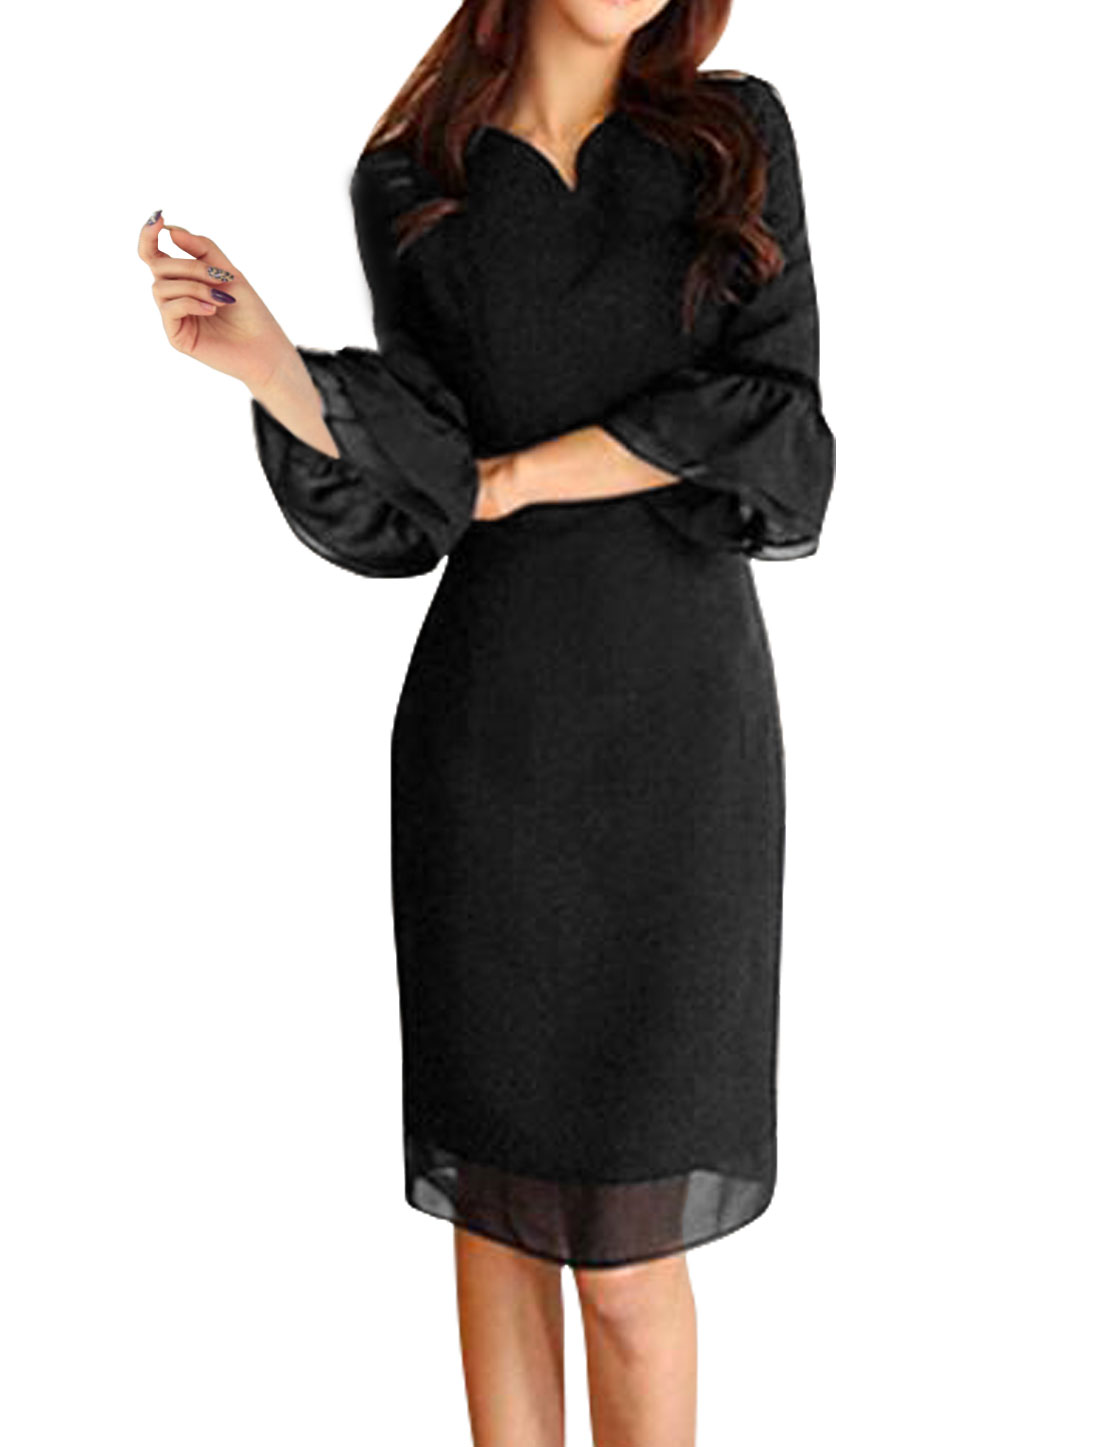 Women 3/4 Ruffled Sleeves Organza Paneled Shift Dress Black S